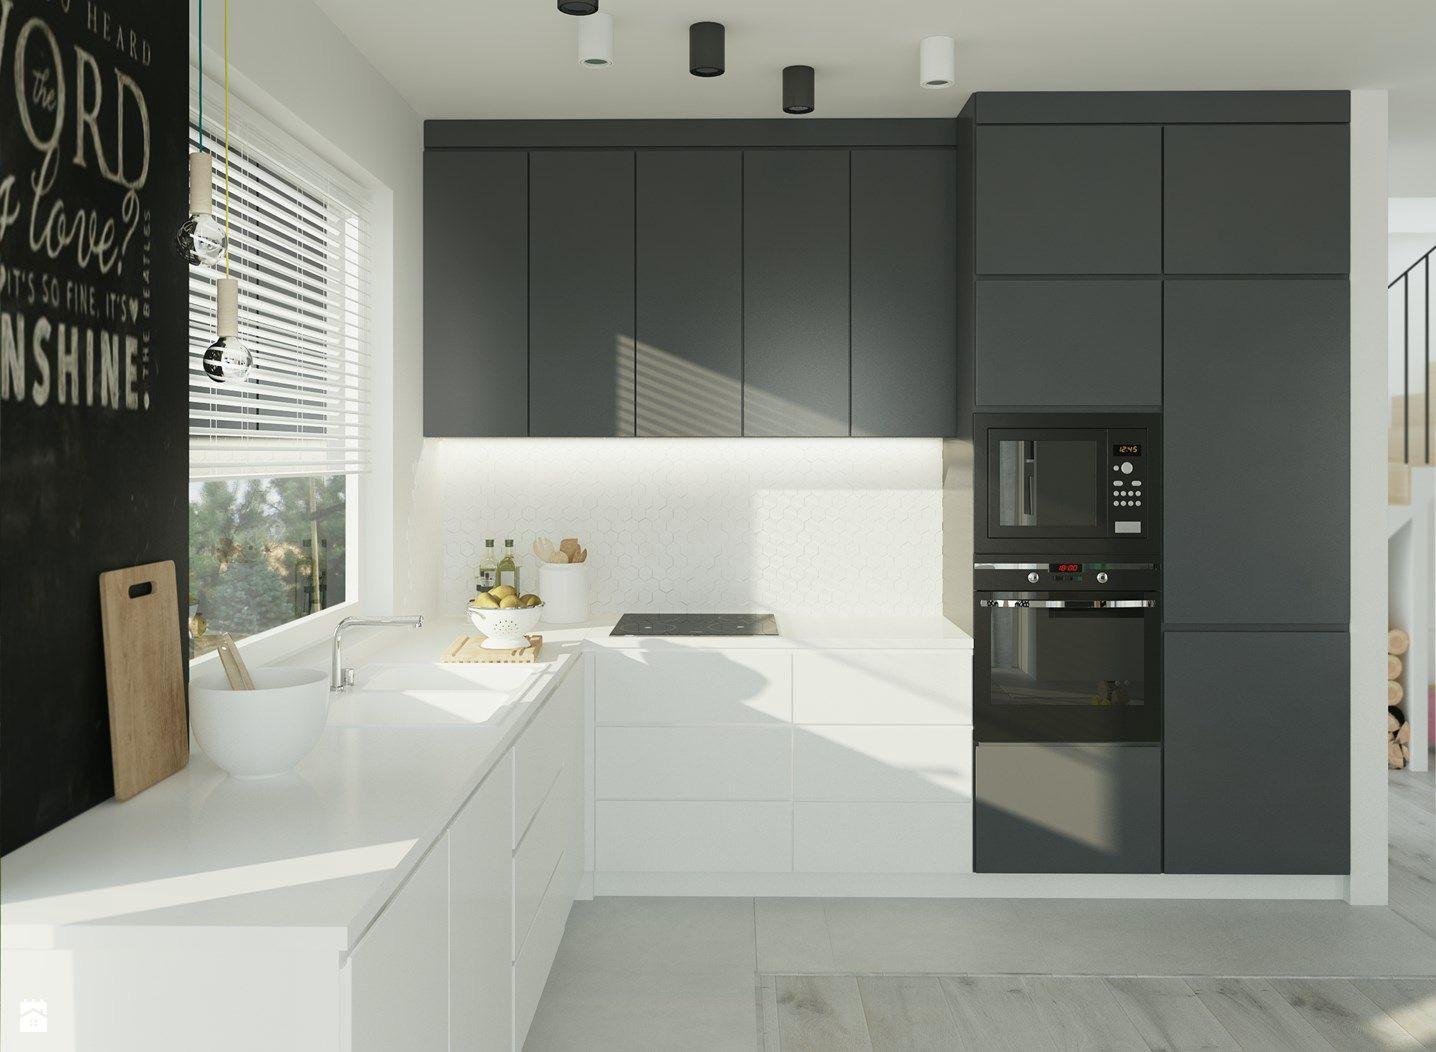 "grey hardwood floors modern of modern grey kitchen cabinets awesome grey wood kitchen cabinets for modern grey kitchen cabinets new aneks kuchenny zdja""a""¢cie od mohav design kuchnia styl image"